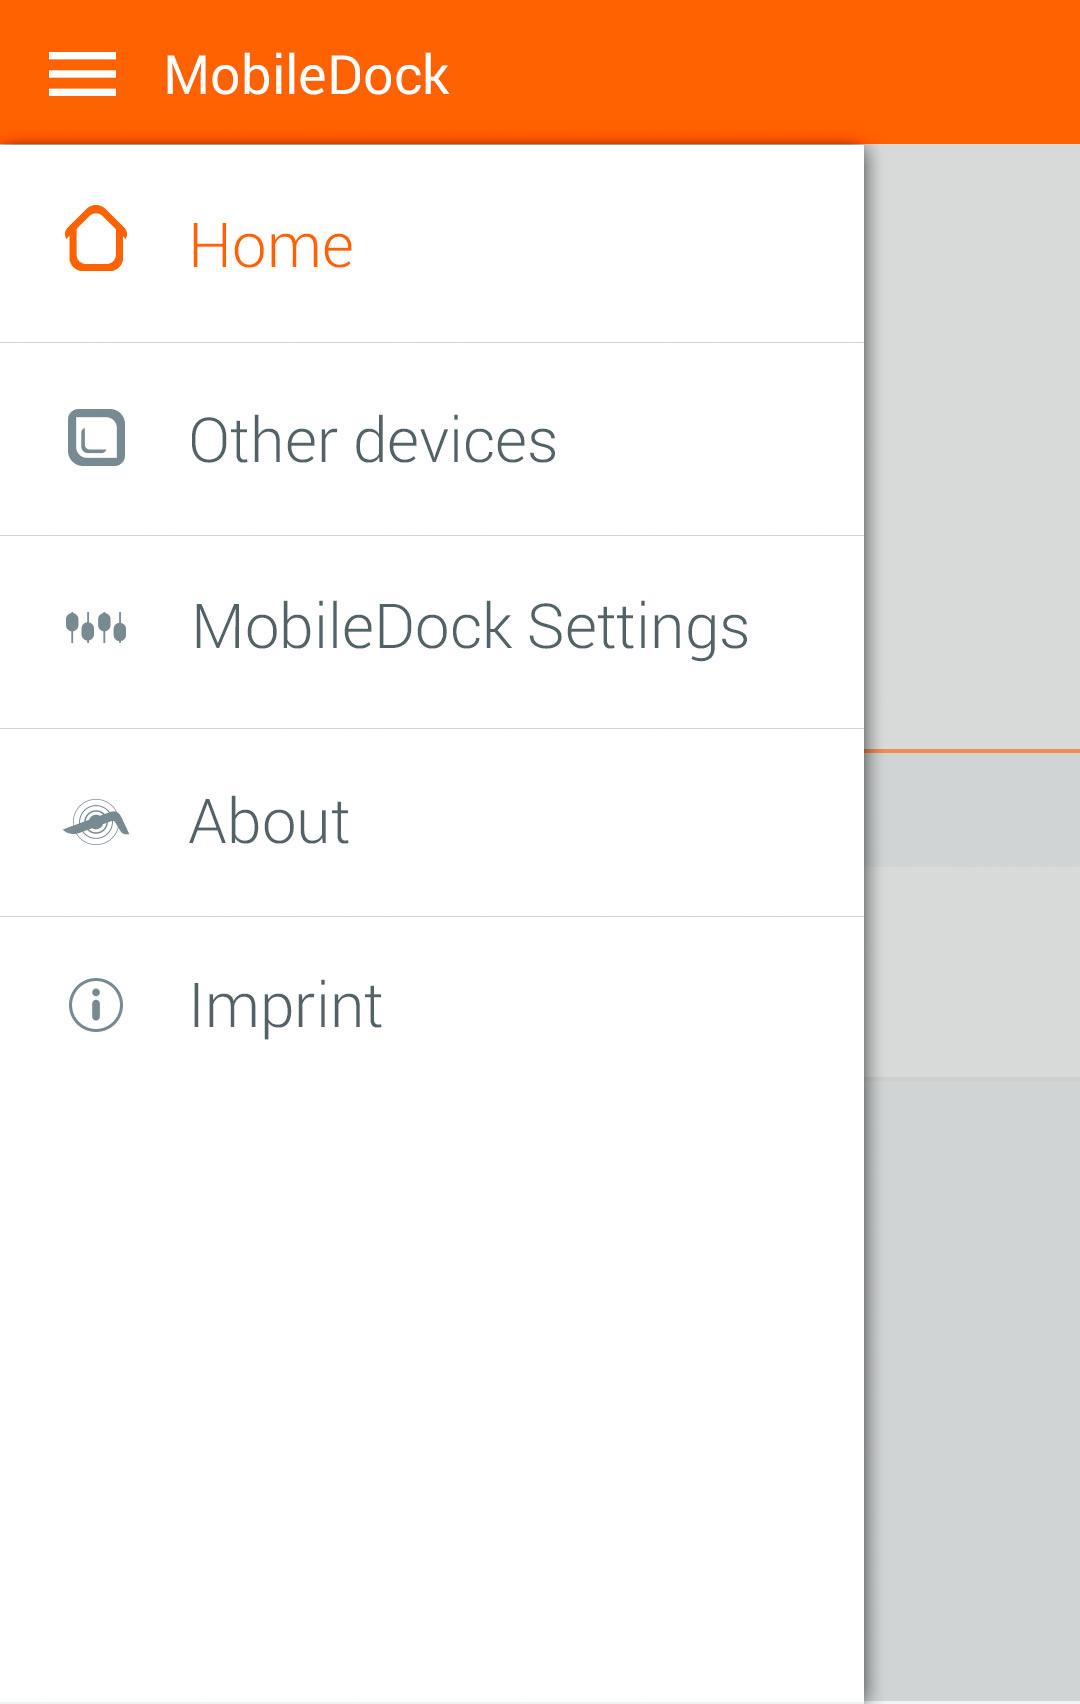 MobileDock_navigation_drawer